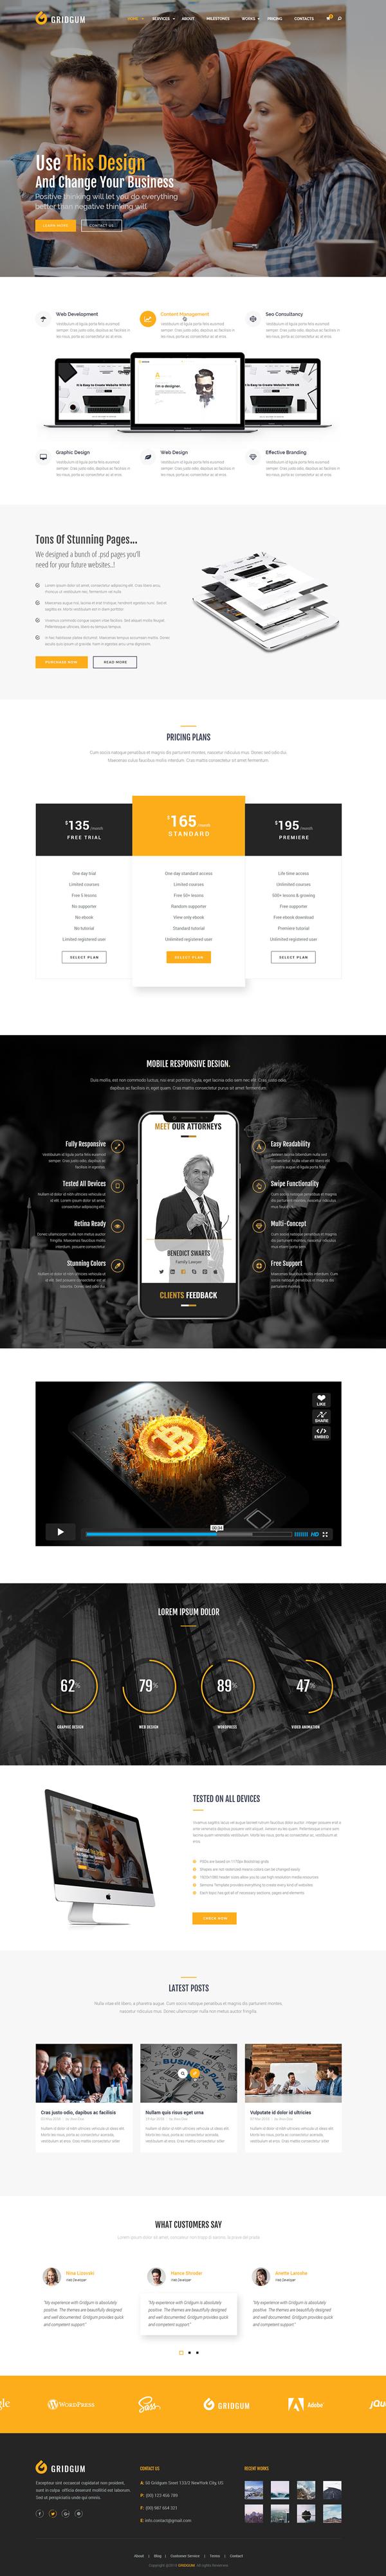 Free Business Website Template (Responsive Design)